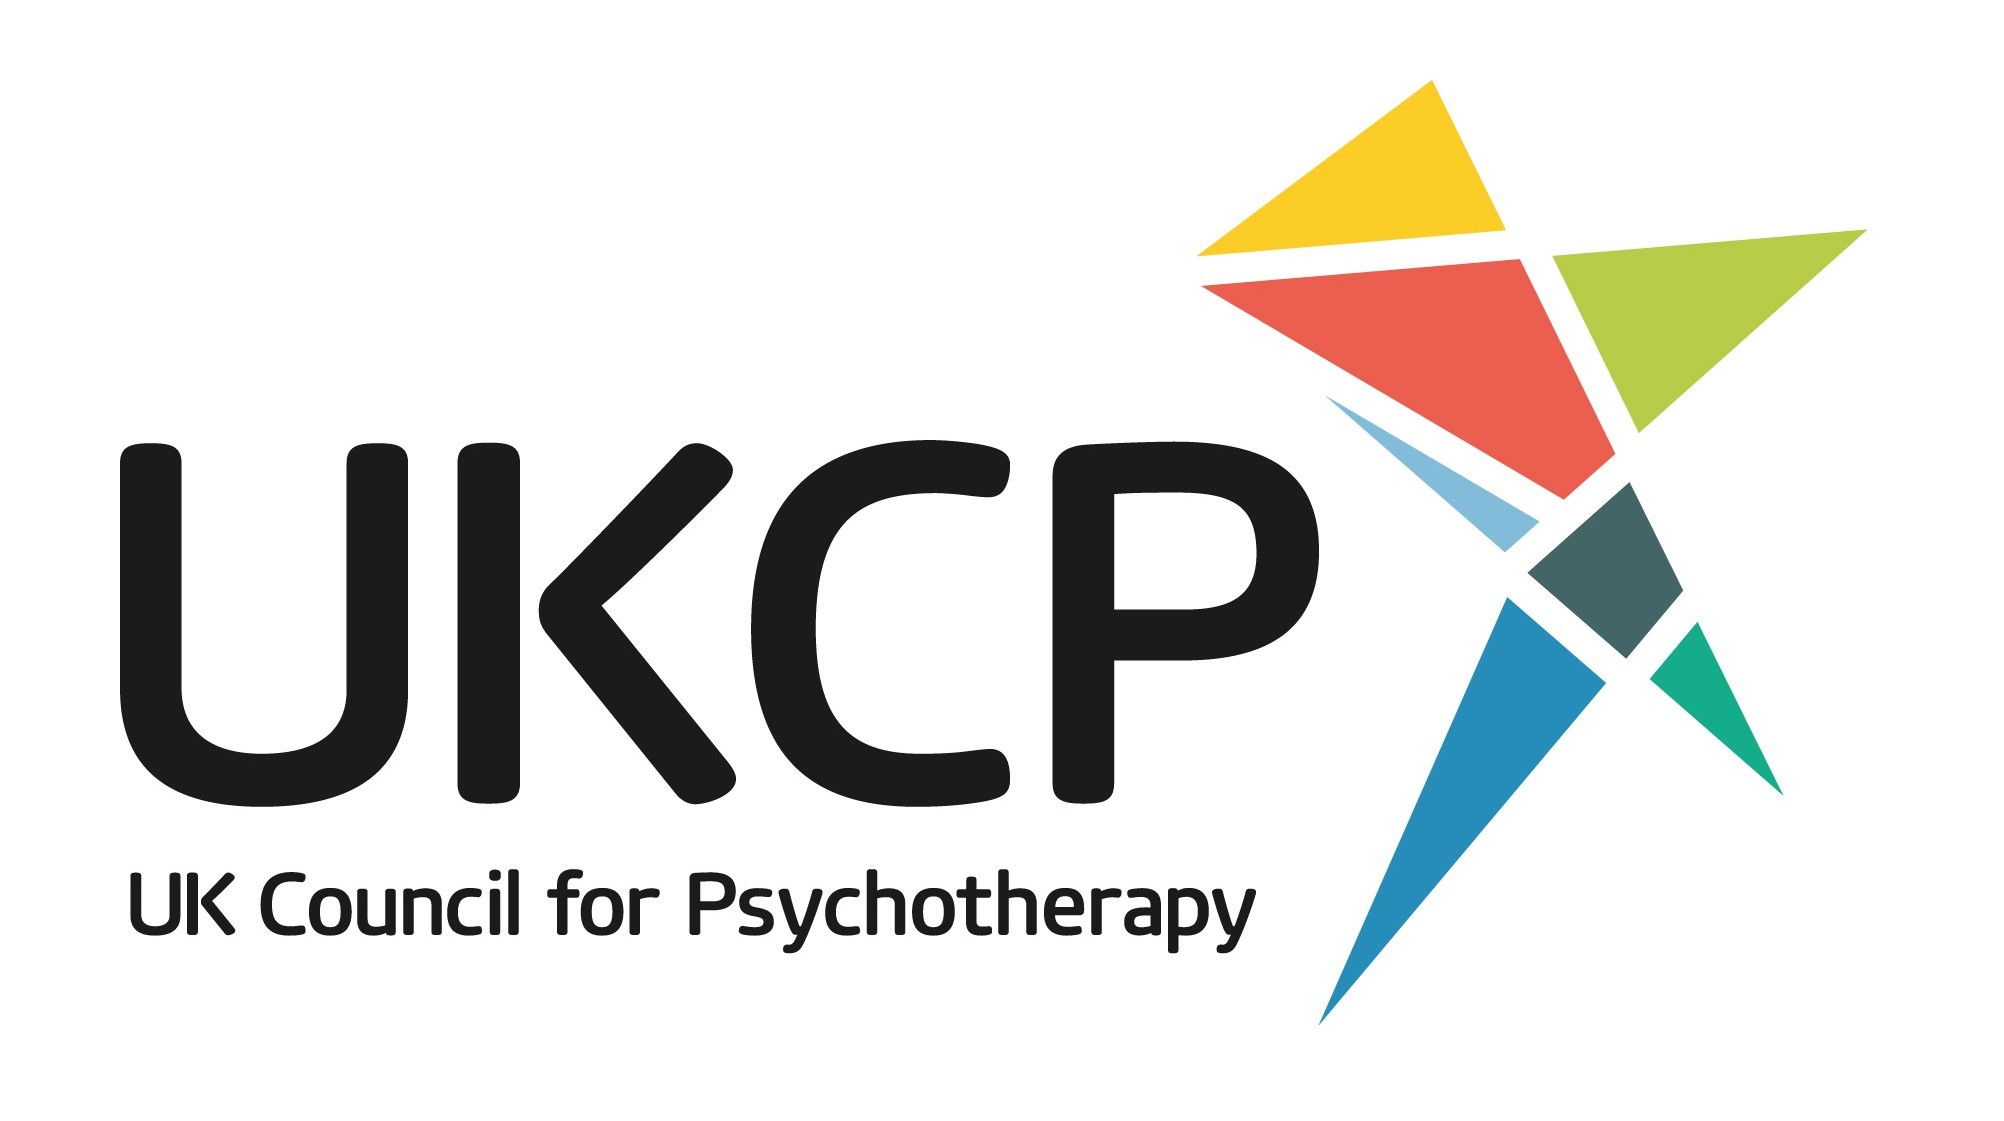 UKCP_Master_Logo_high_res.jpg